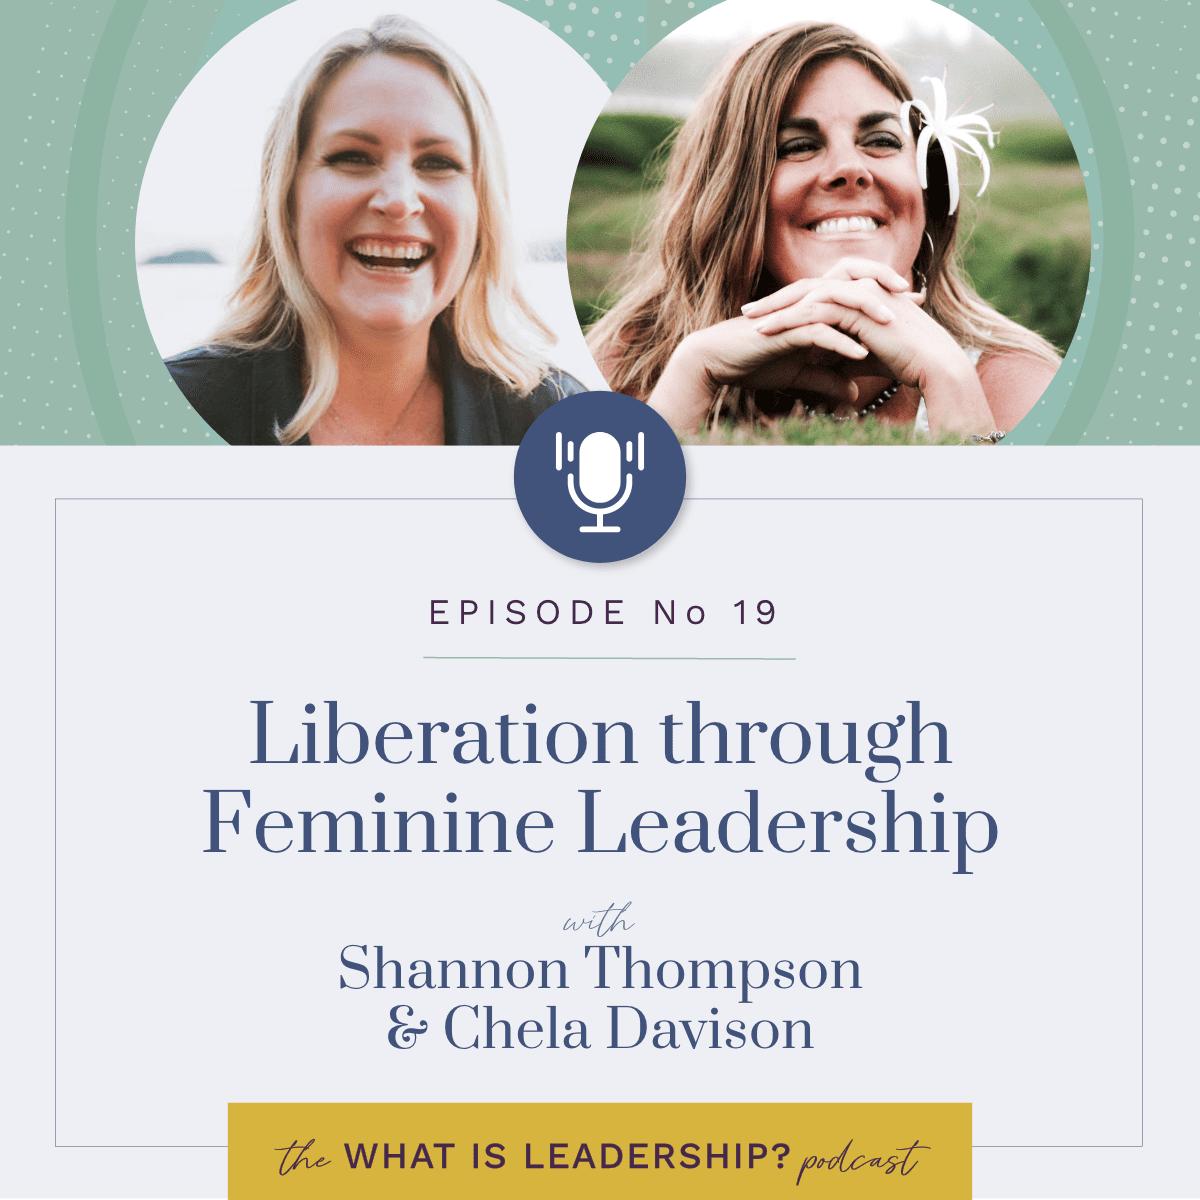 19 – Liberation through Feminine Leadership with Shannon Thompson